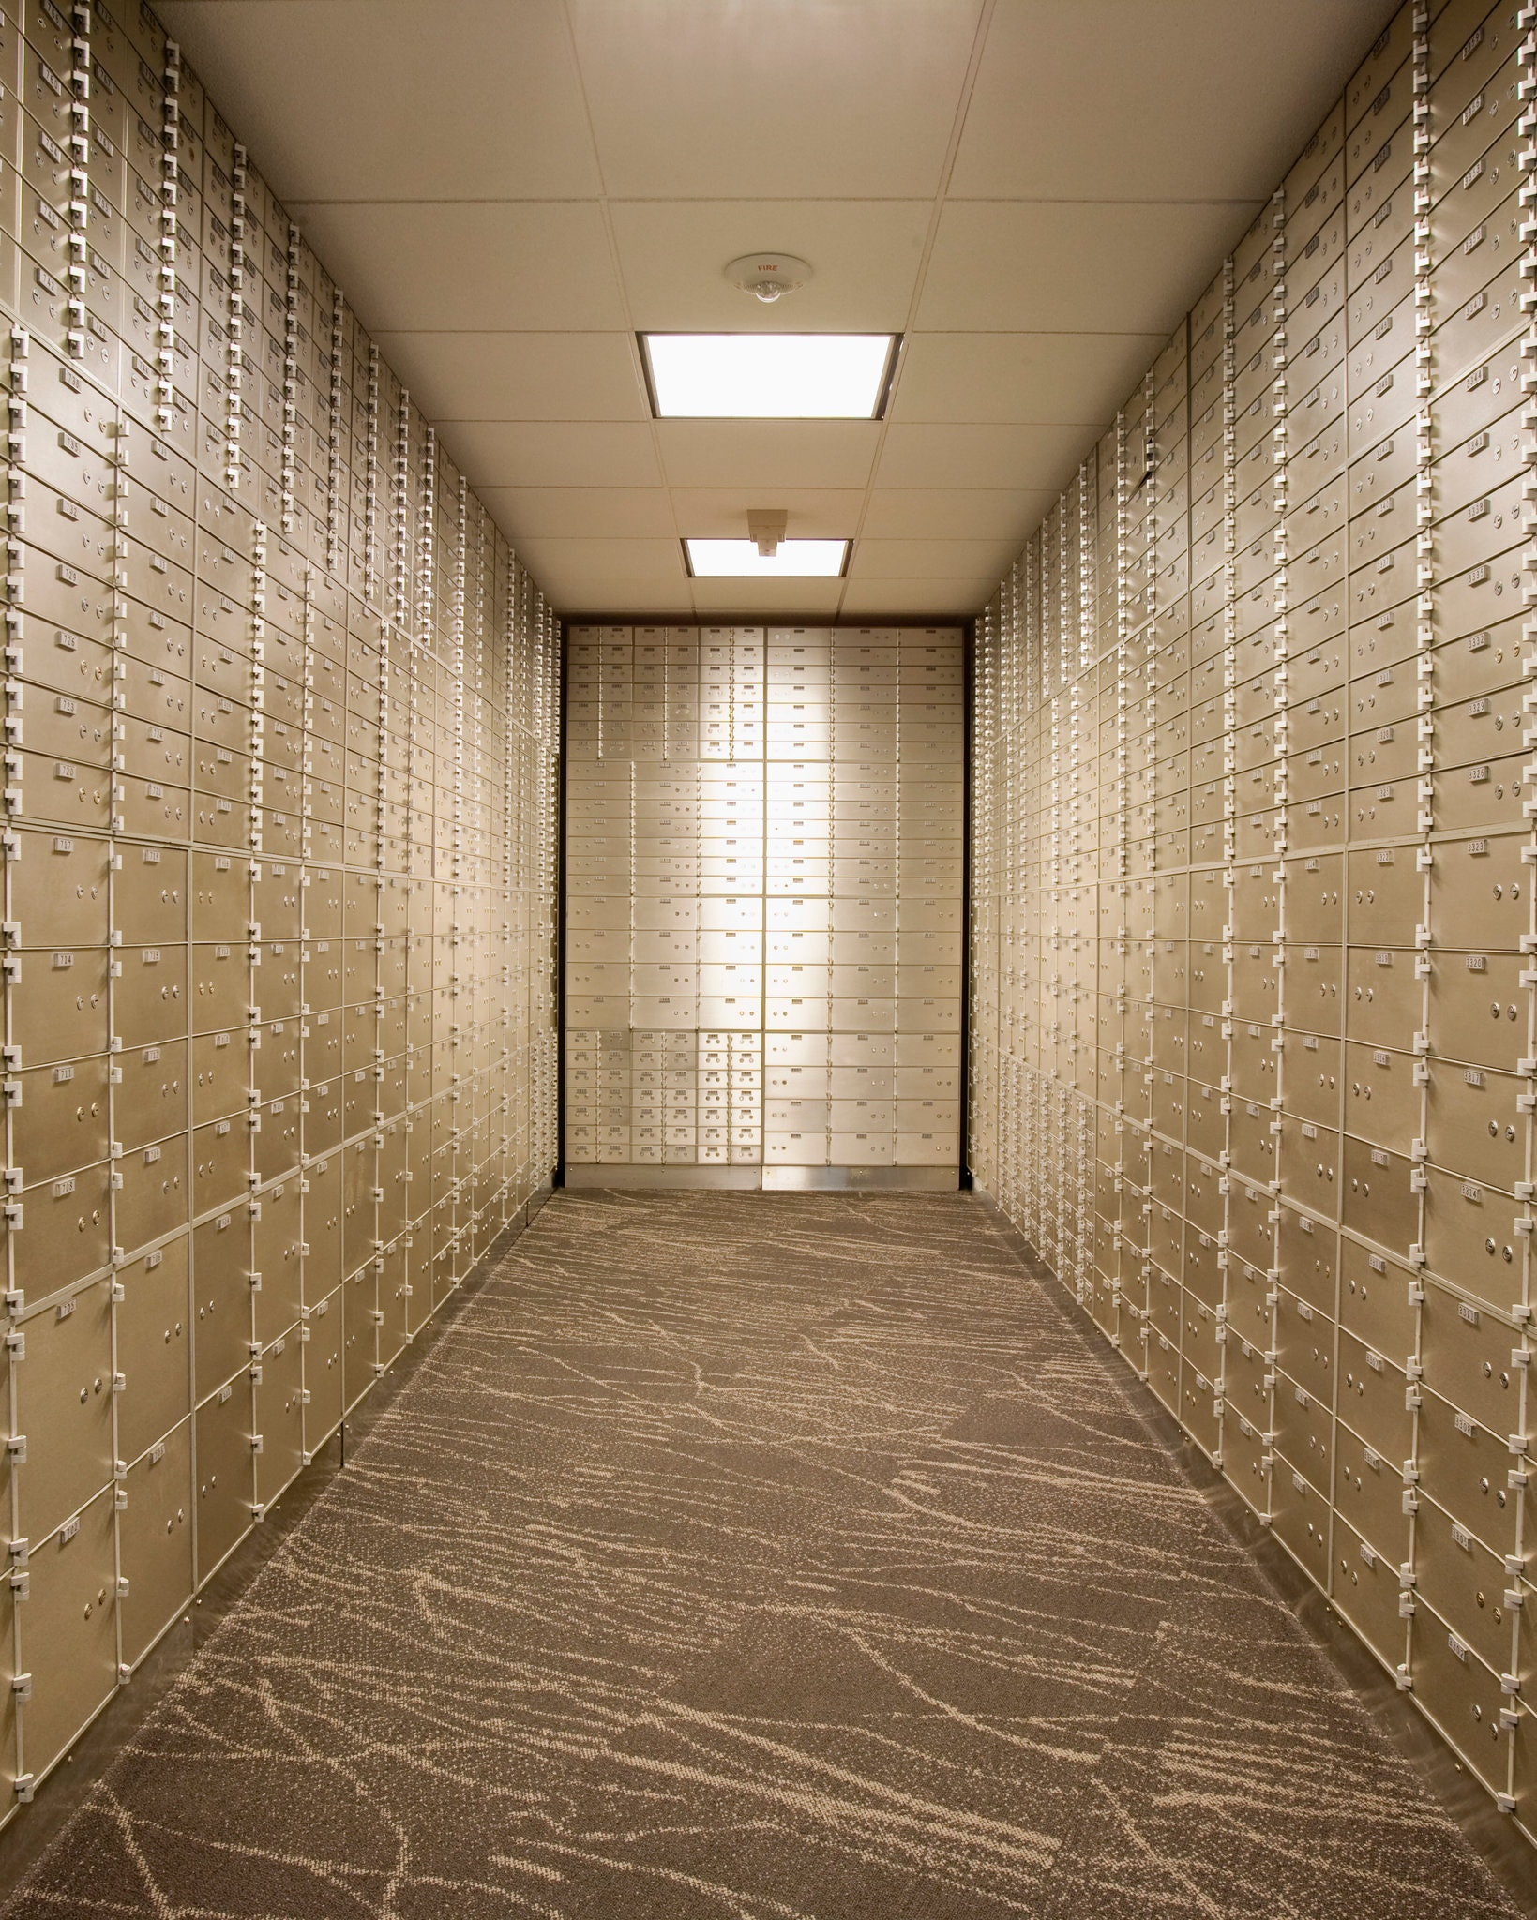 RECOMMENDED READING: Safe deposit boxes aren't so safe